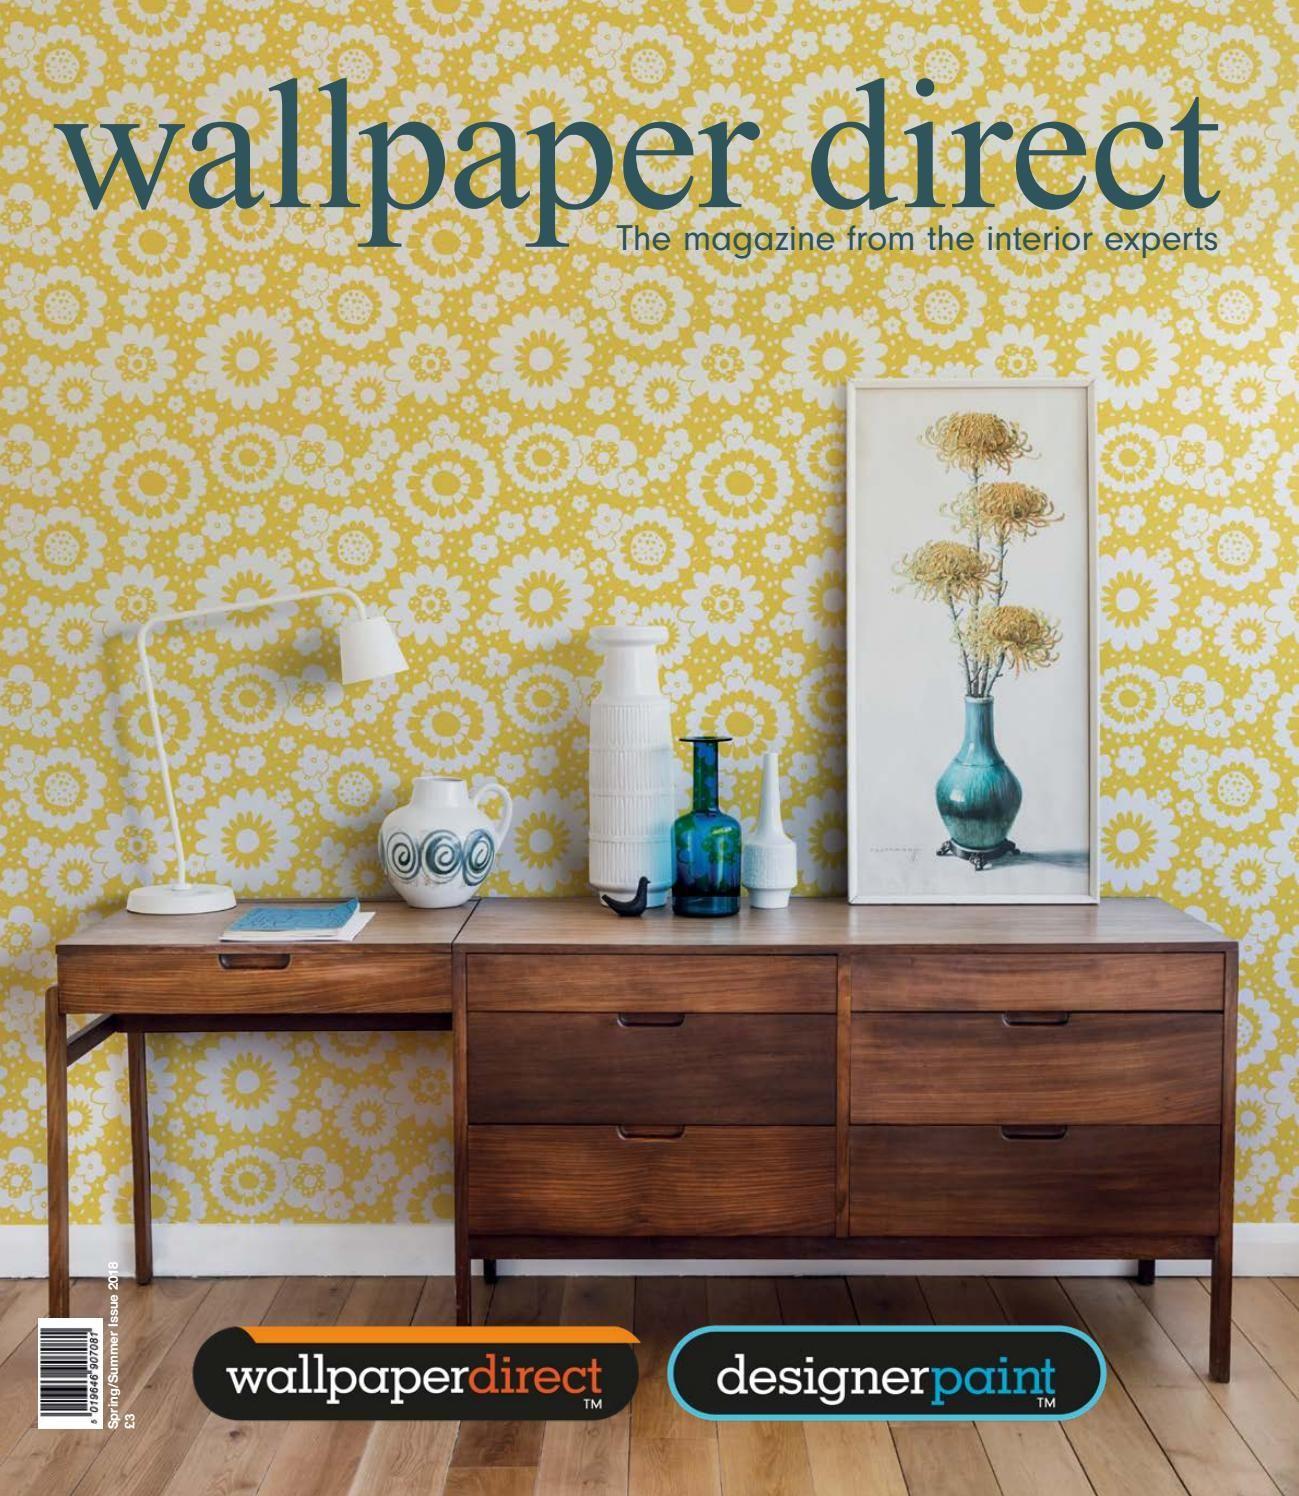 wallpaper direct - S/S2018 | haz | Pinterest | Wallpaper direct ...